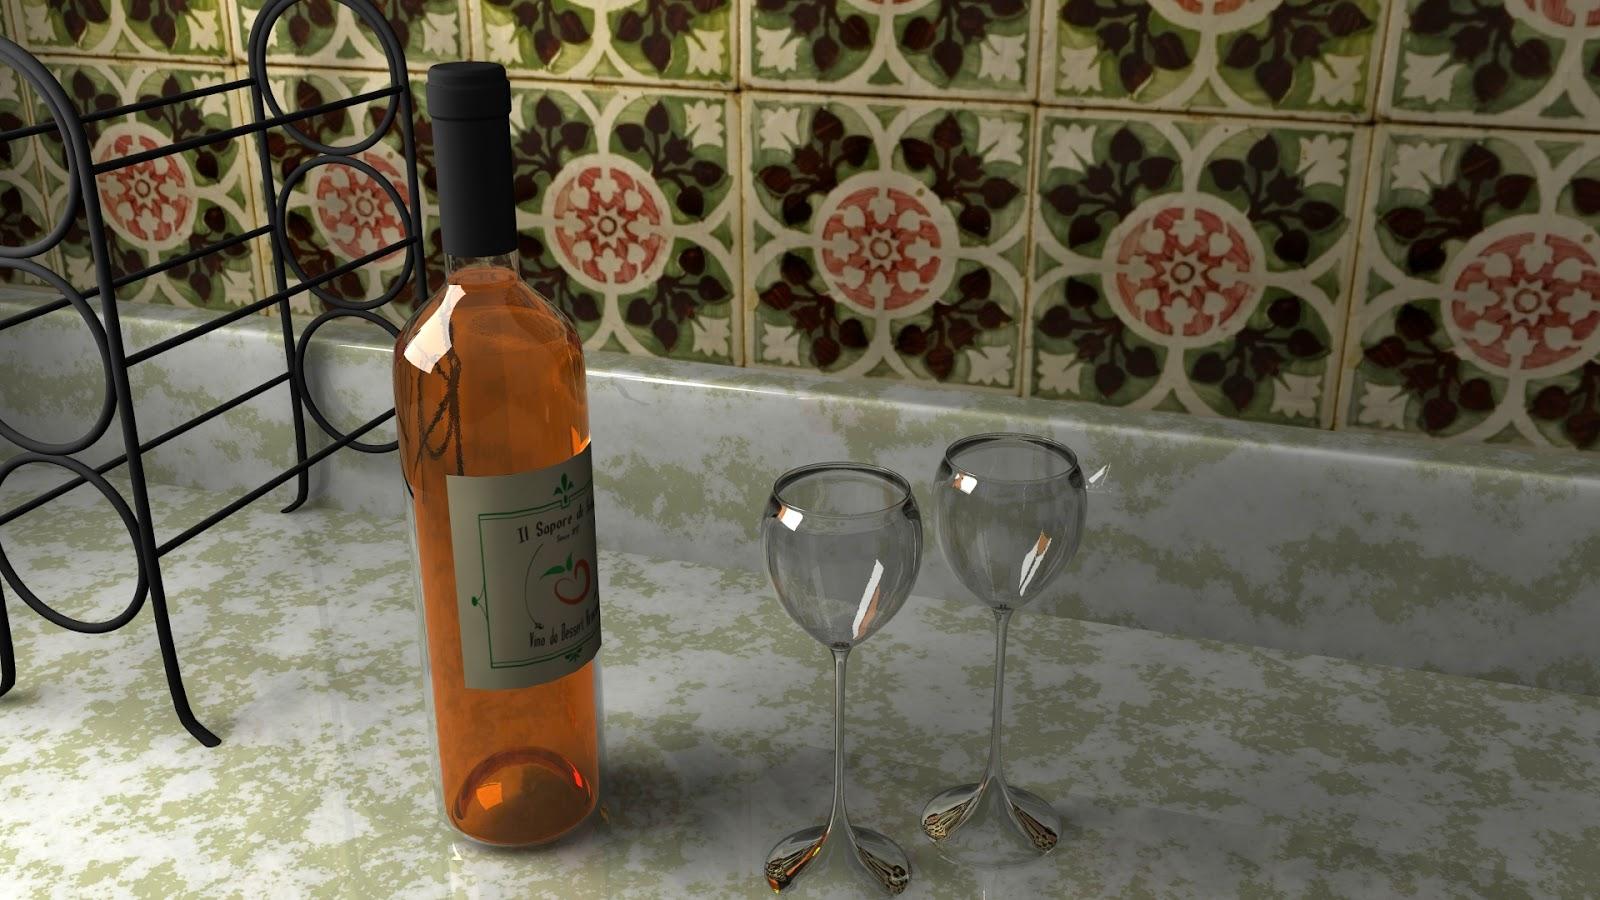 cunningham_wine_bottle